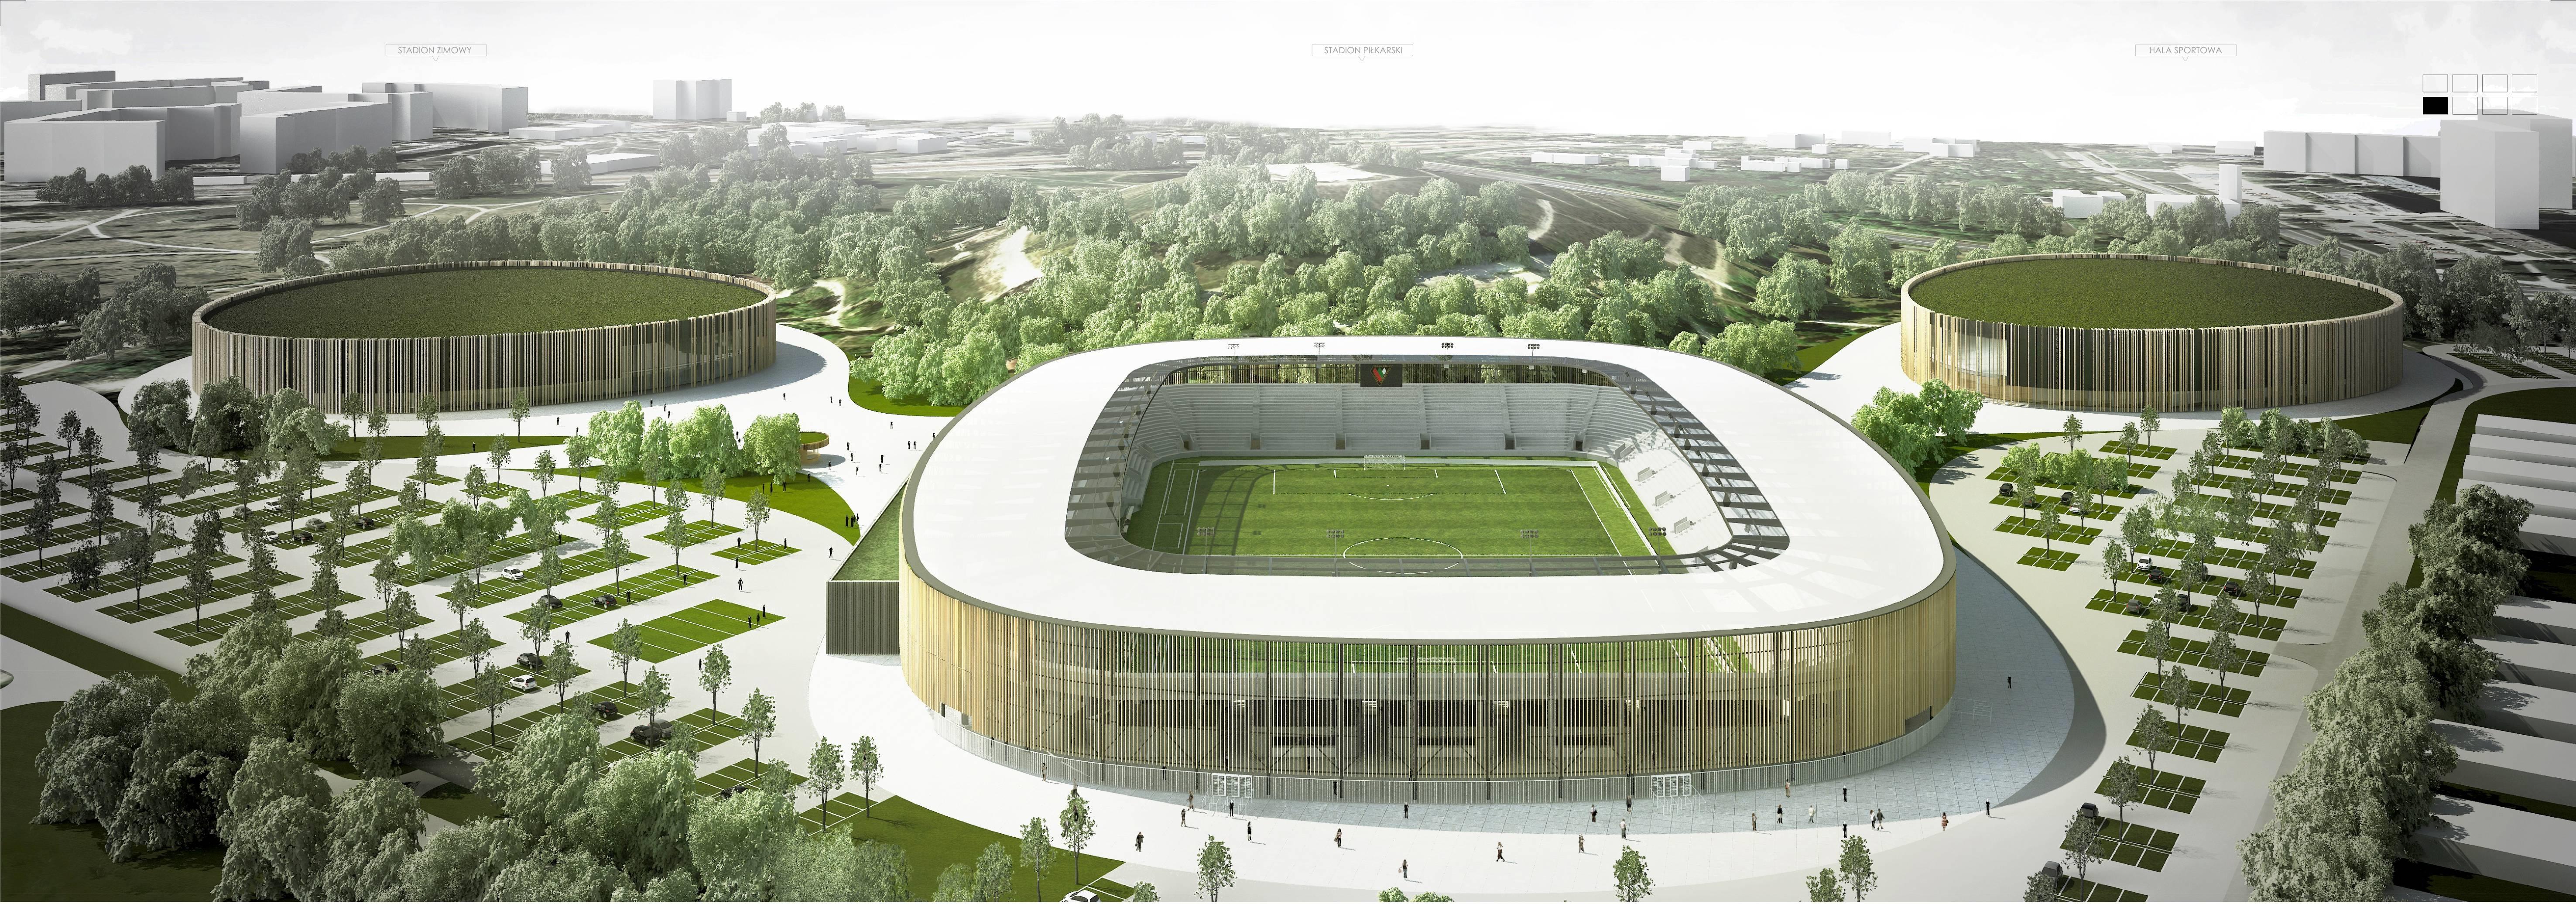 Stadiony 3